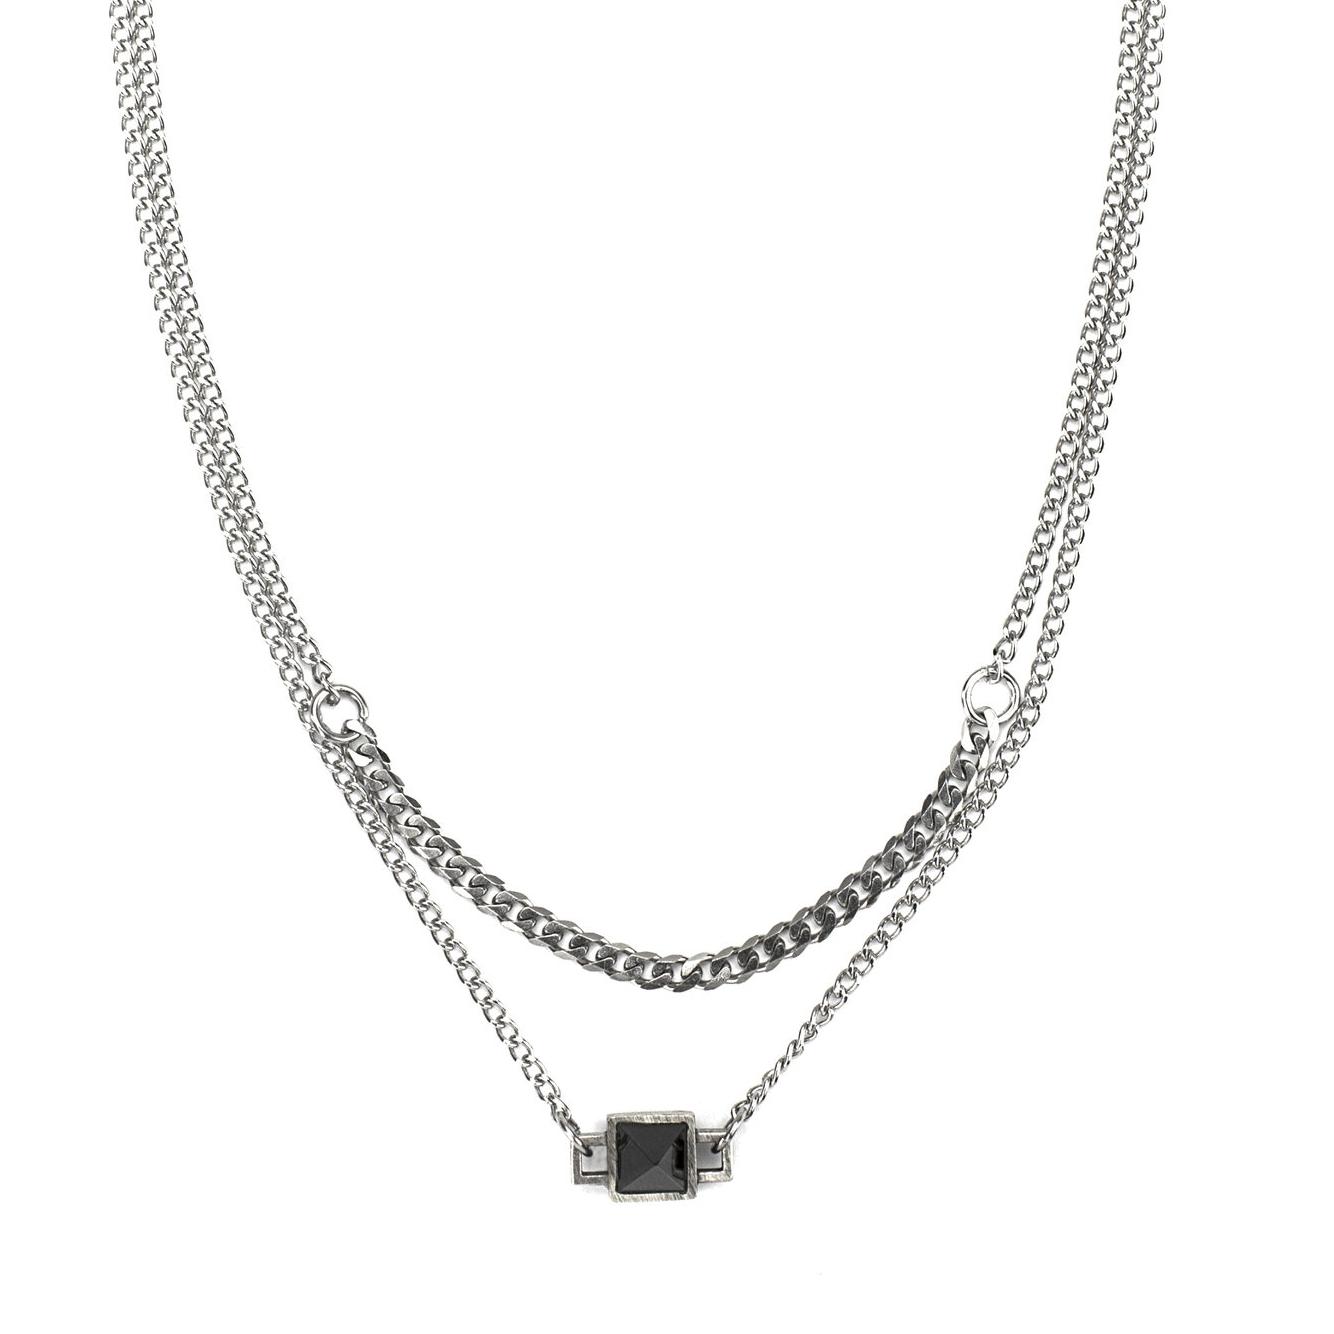 Necklace-EDITf.jpg